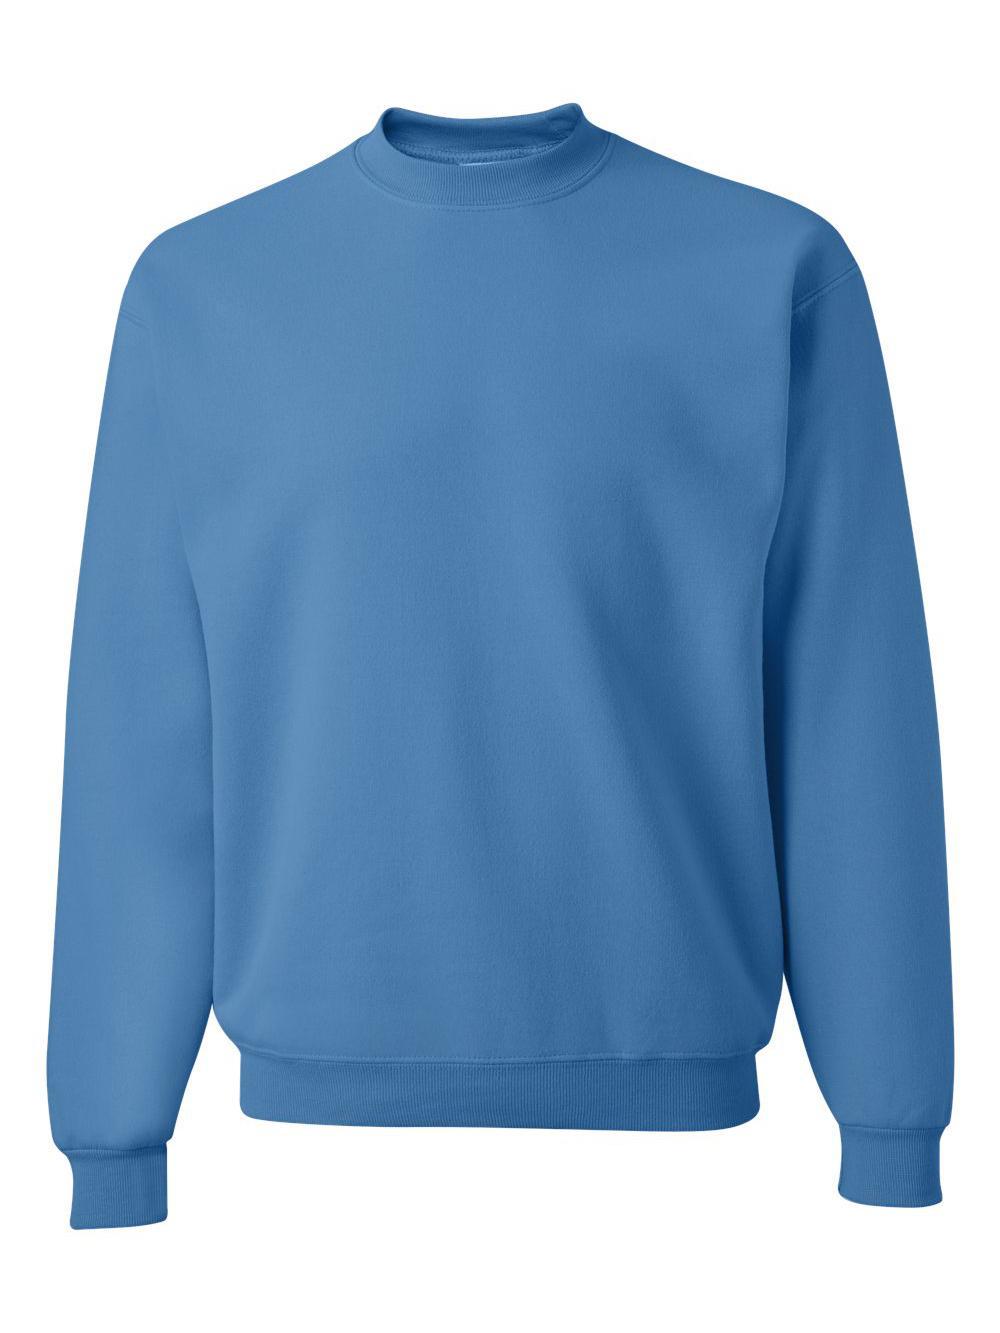 Jerzees-NuBlend-Crewneck-Sweatshirt-562MR thumbnail 30